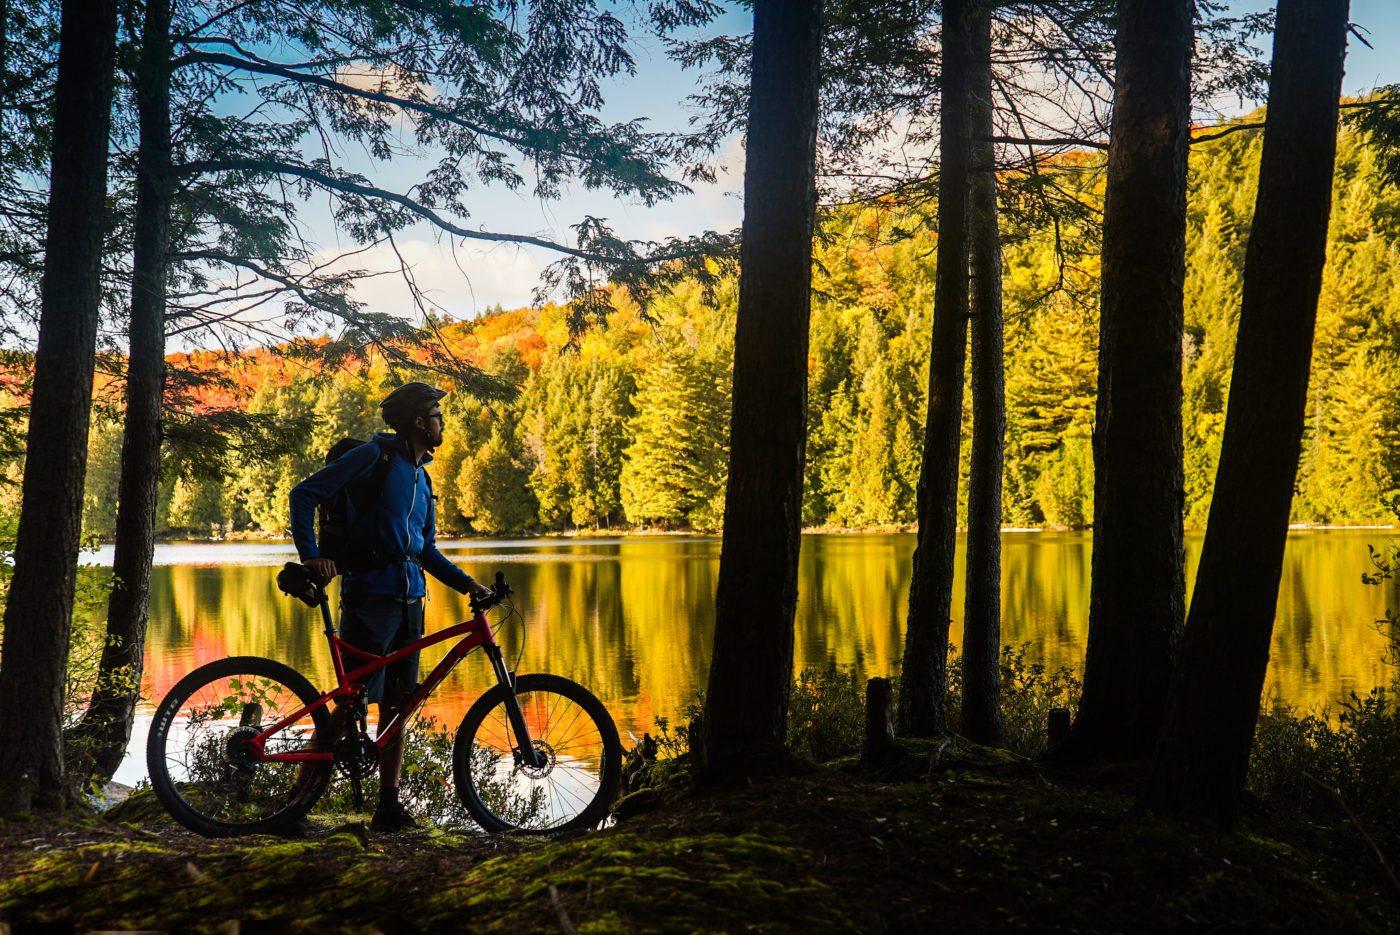 forest bike